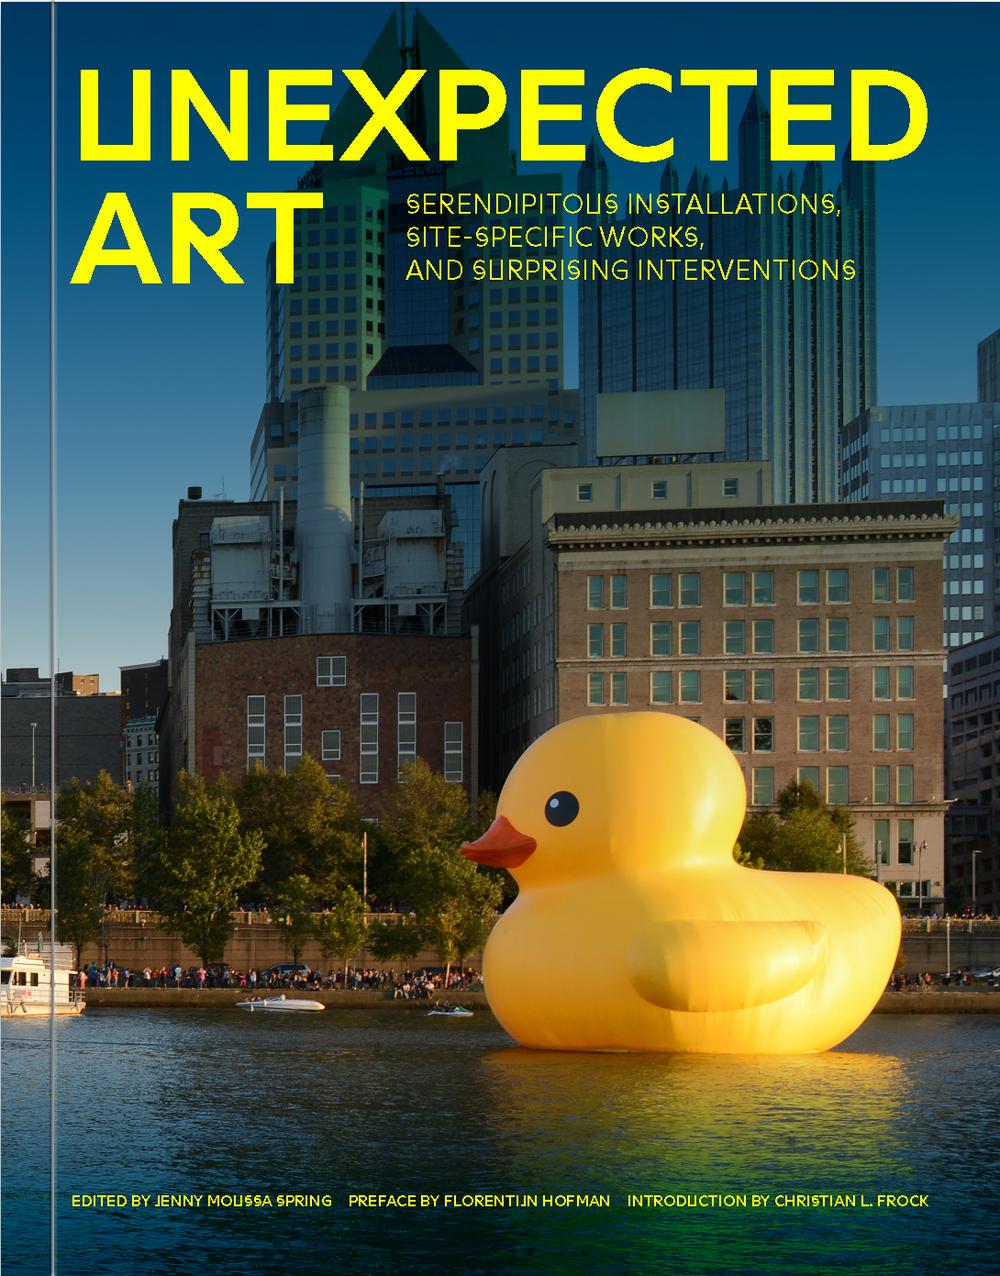 UNEXPECTED ART